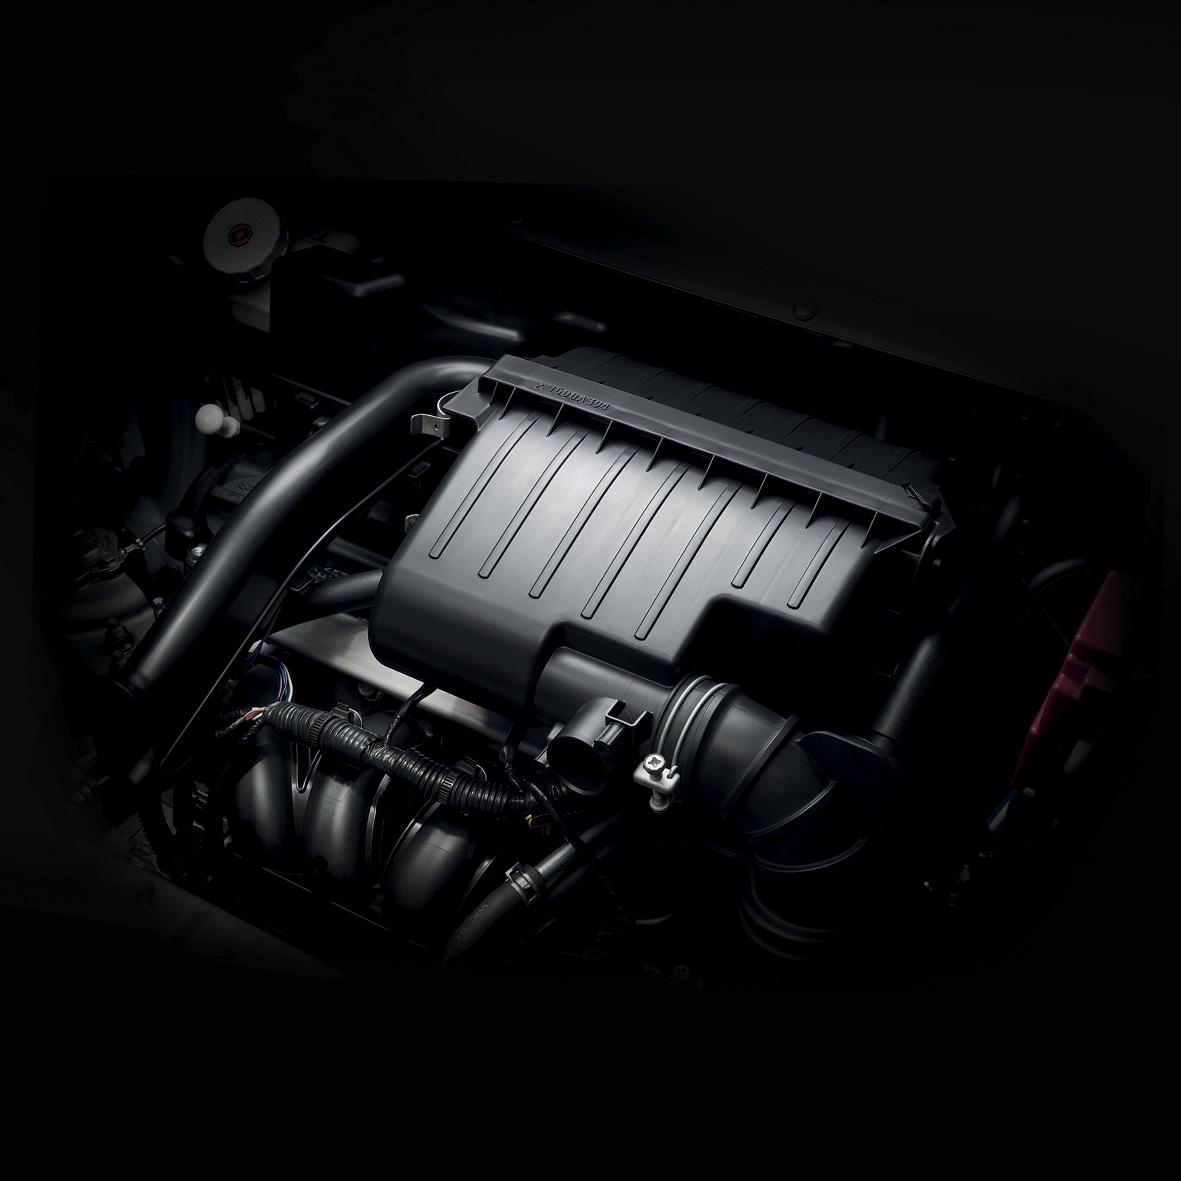 Mitsubishi_MX_MirageG4_MIVEC engine